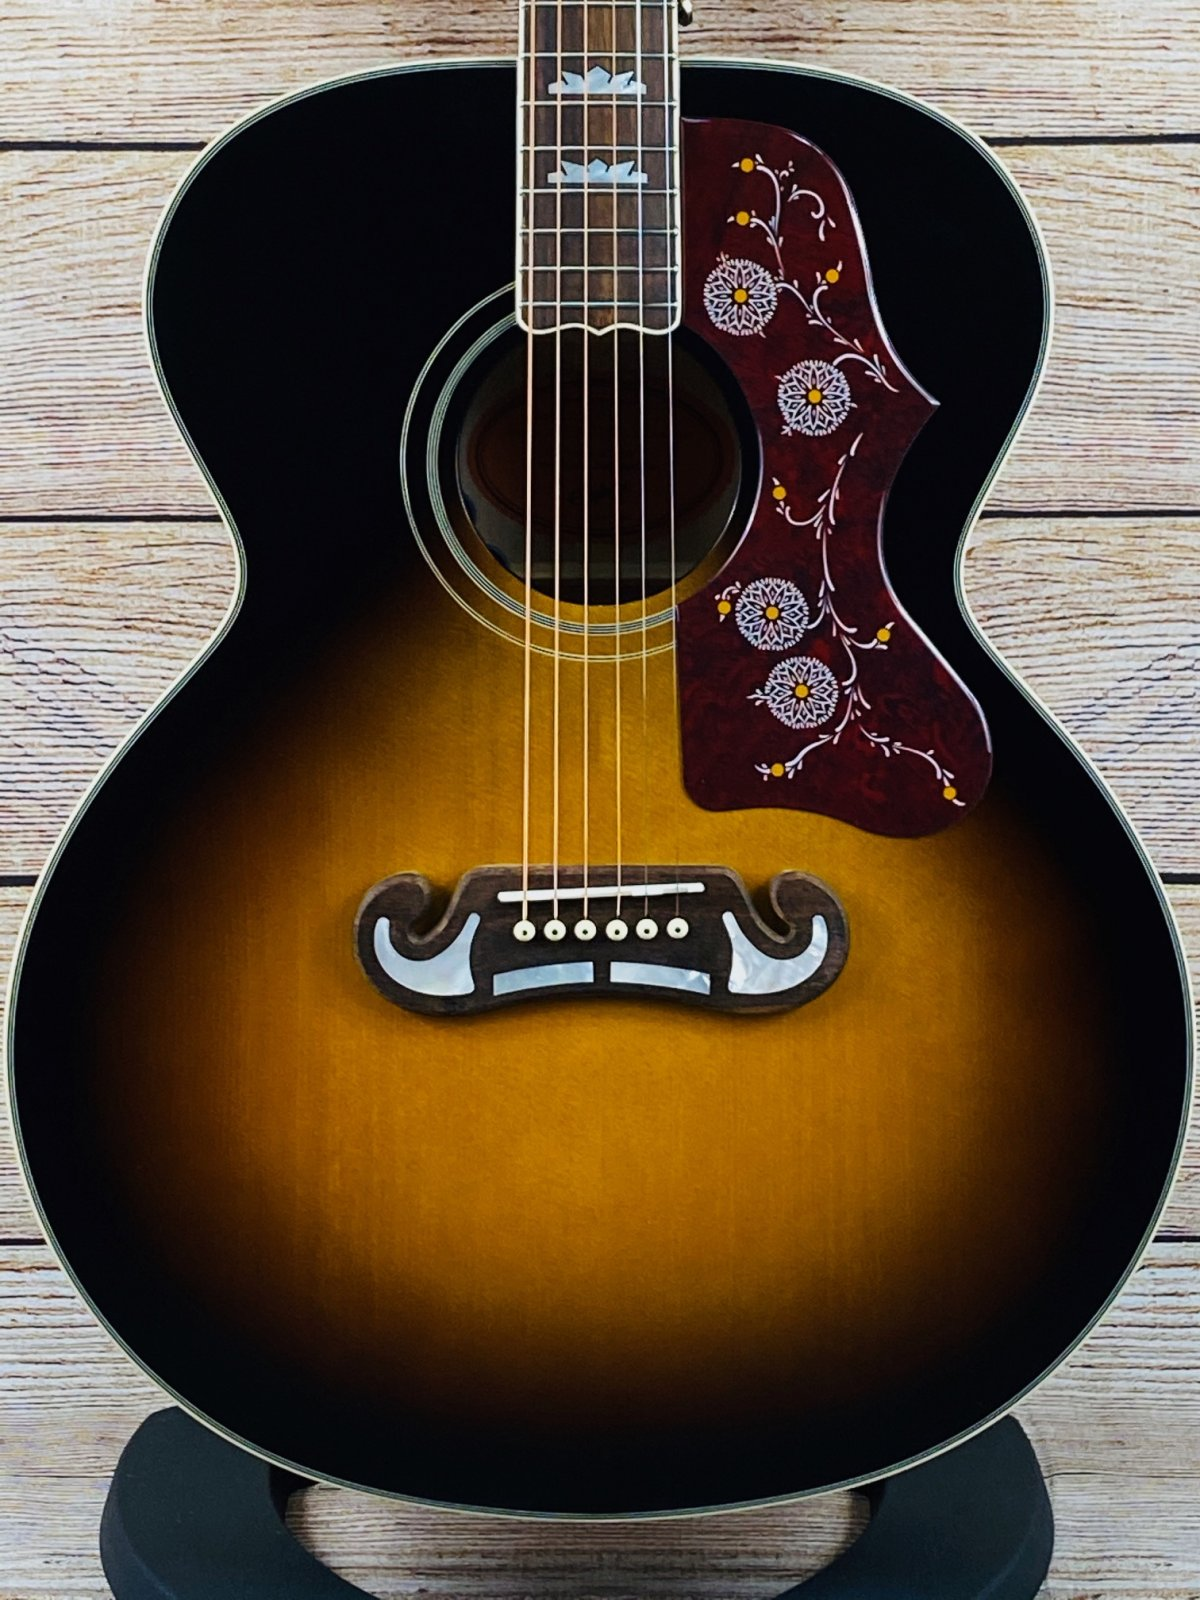 Epiphone J-200 Acoustic Guitar - Aged Vintage Sunburst Gloss